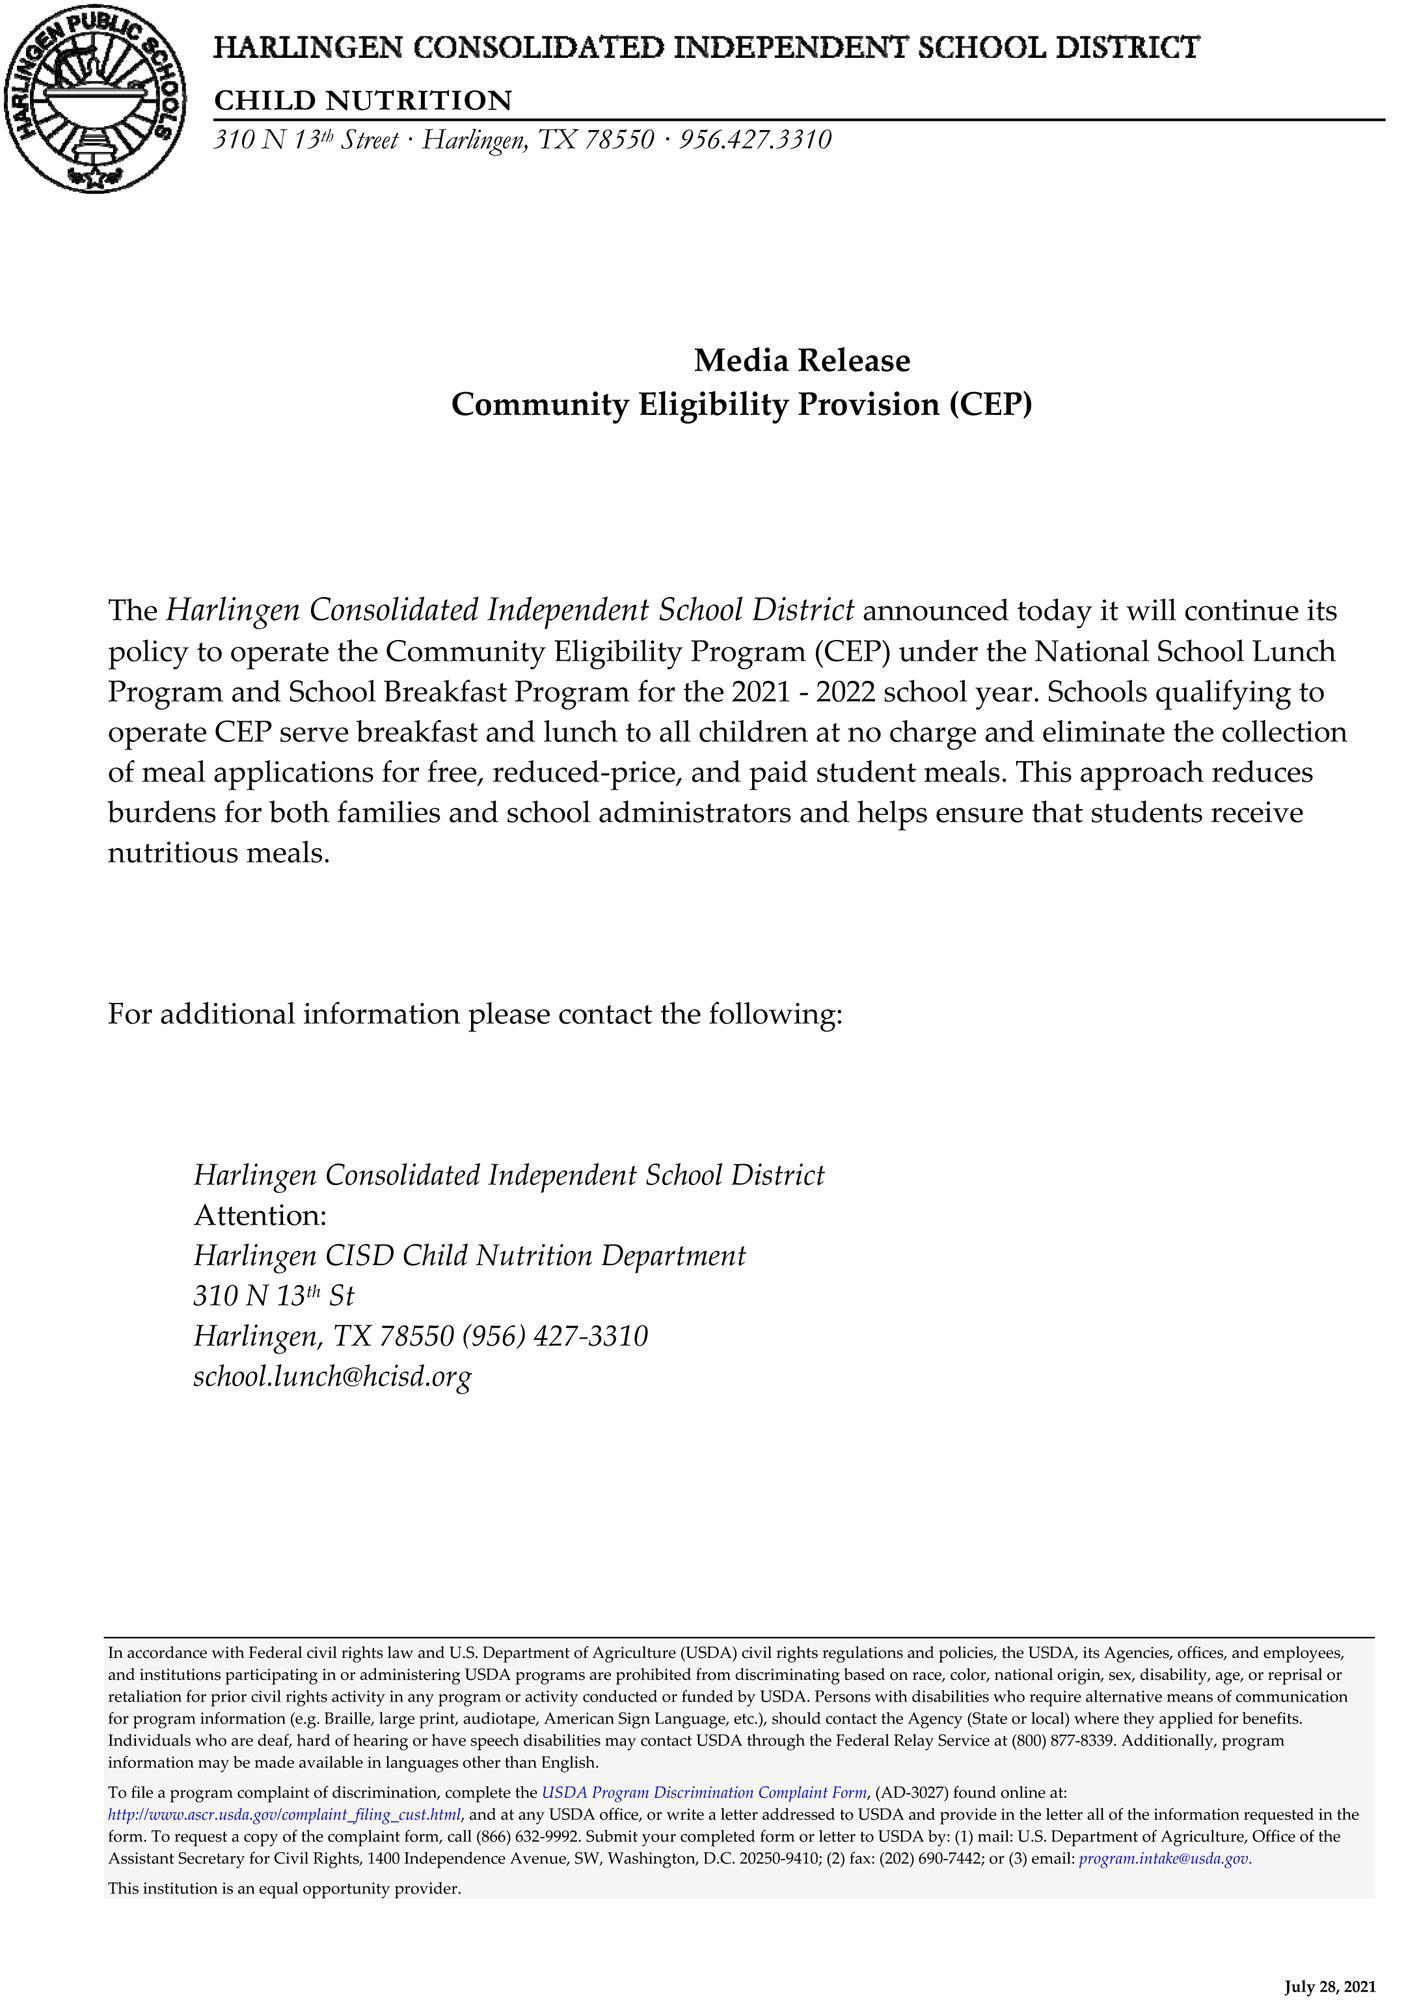 CEP Media Release